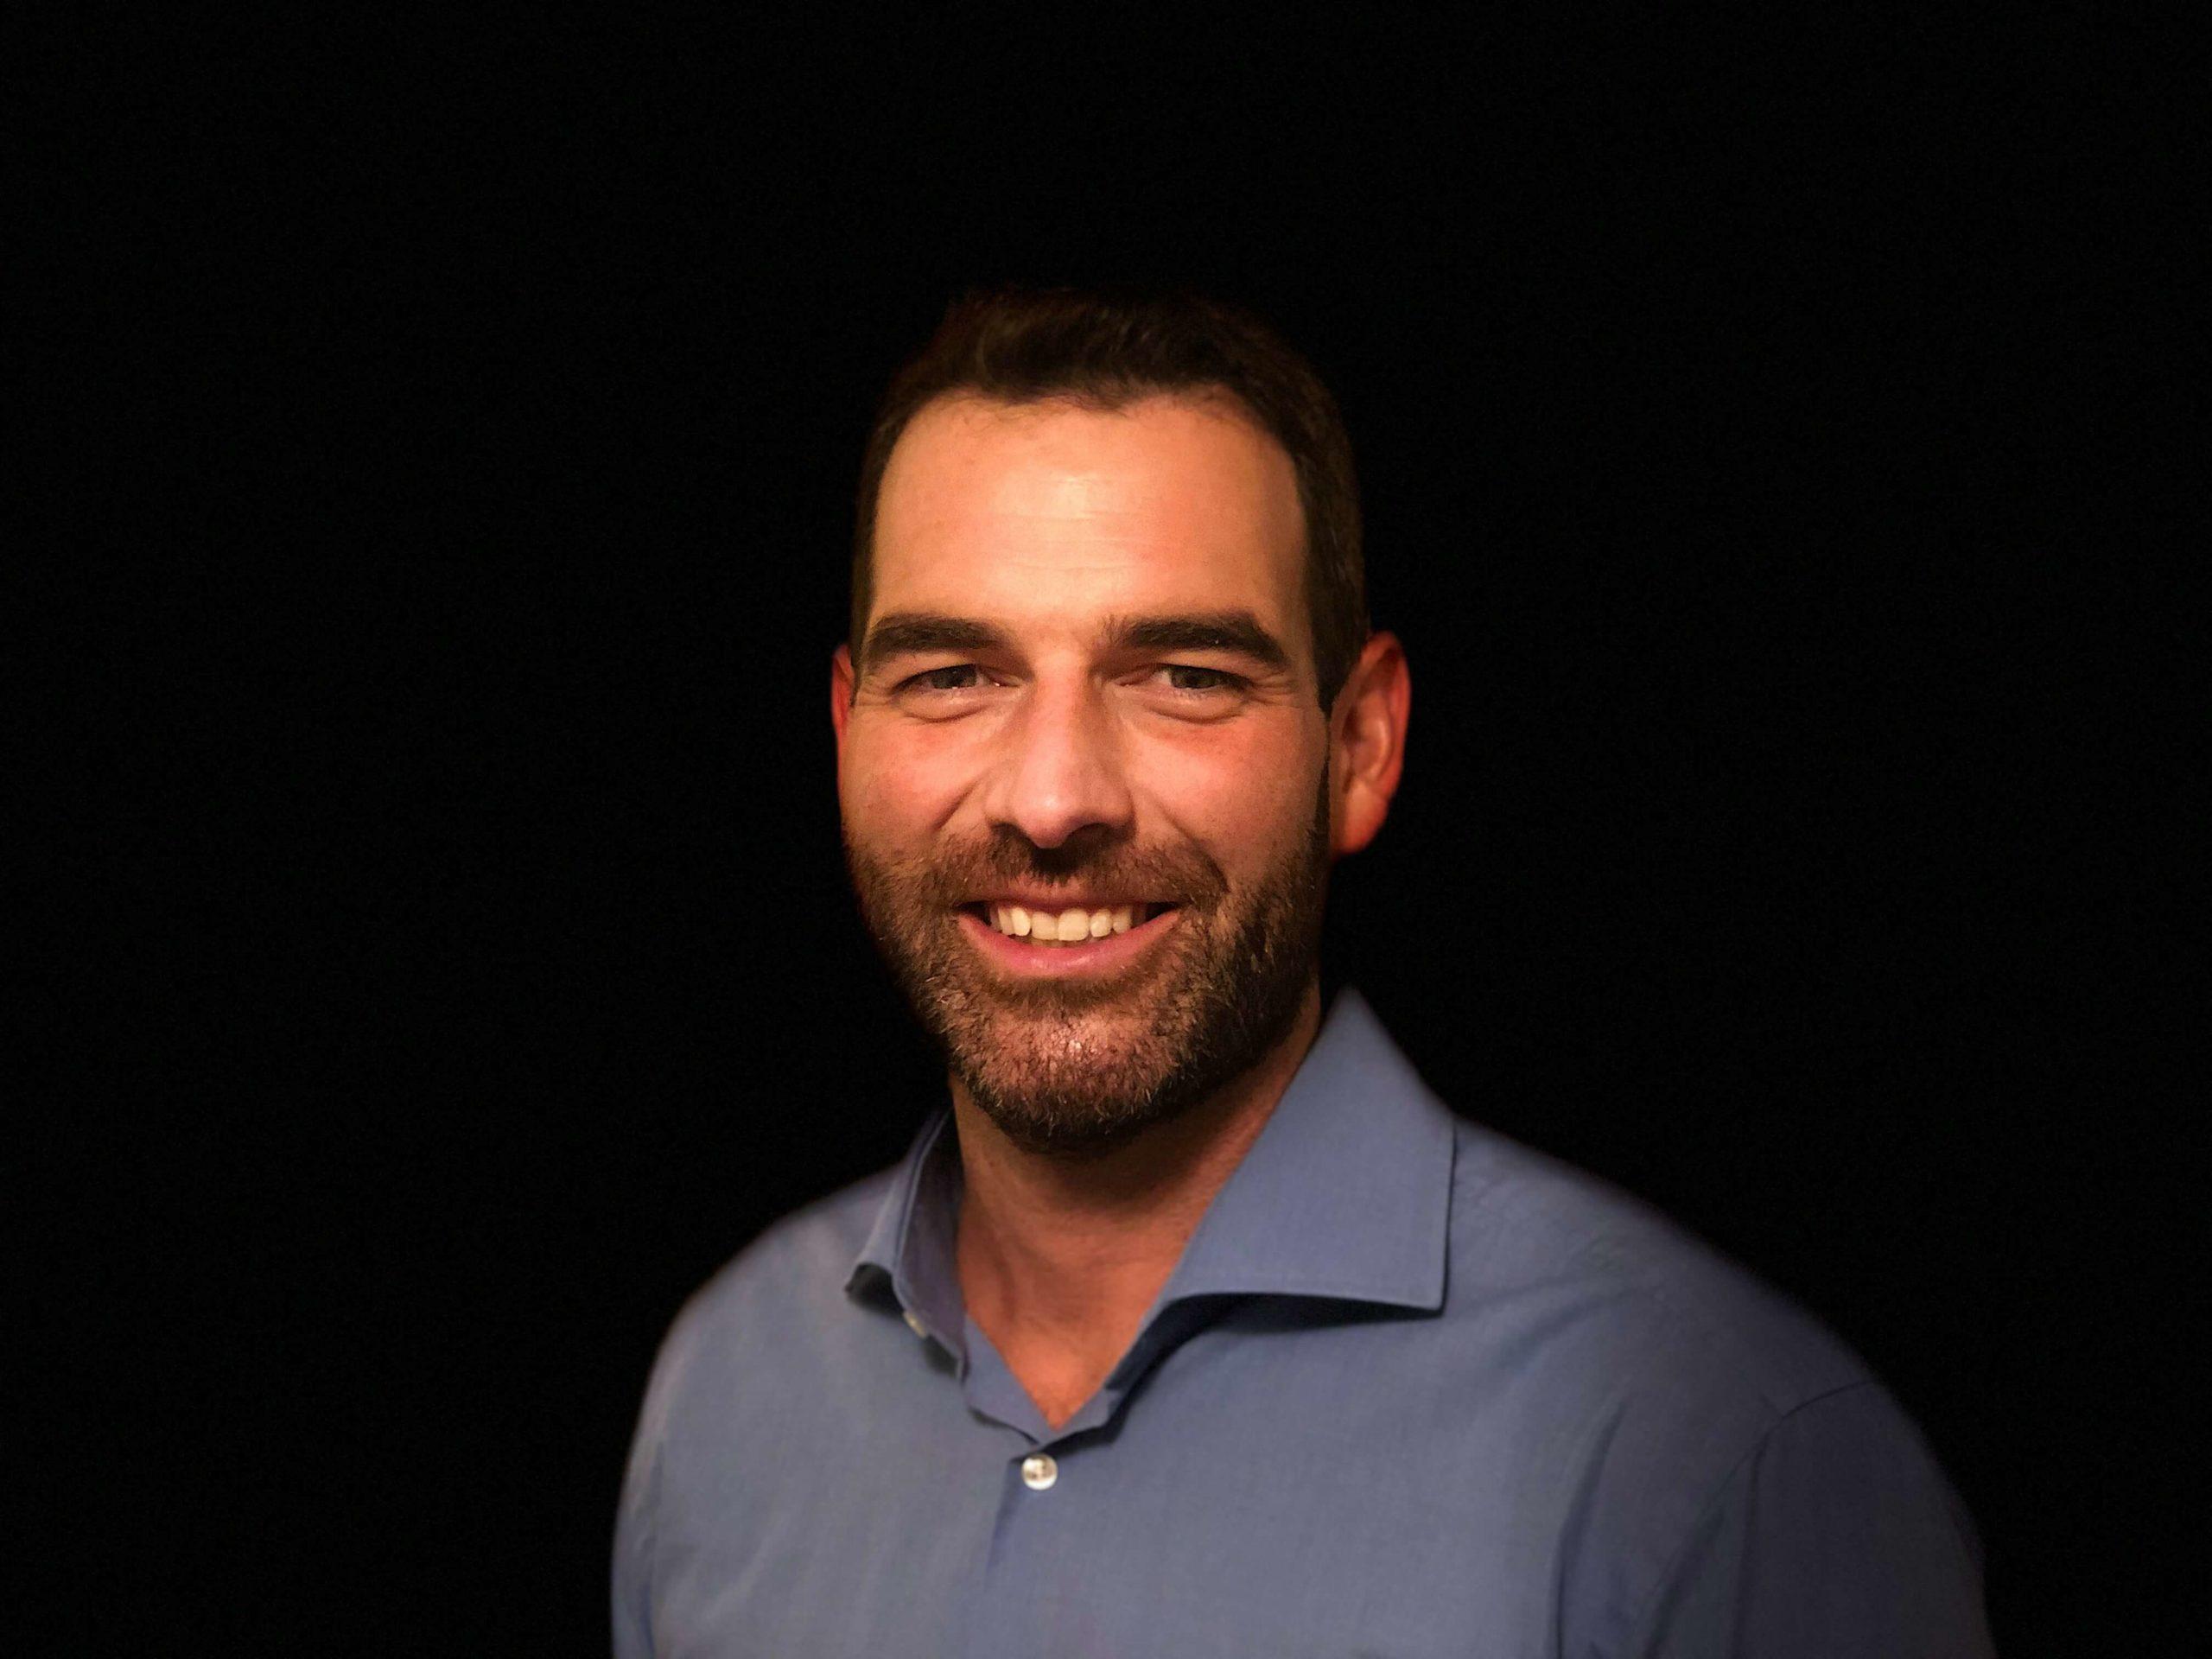 Tony Demuri, PT, DPT - Physical Therapist Austin Tx - Physical Therapist near me